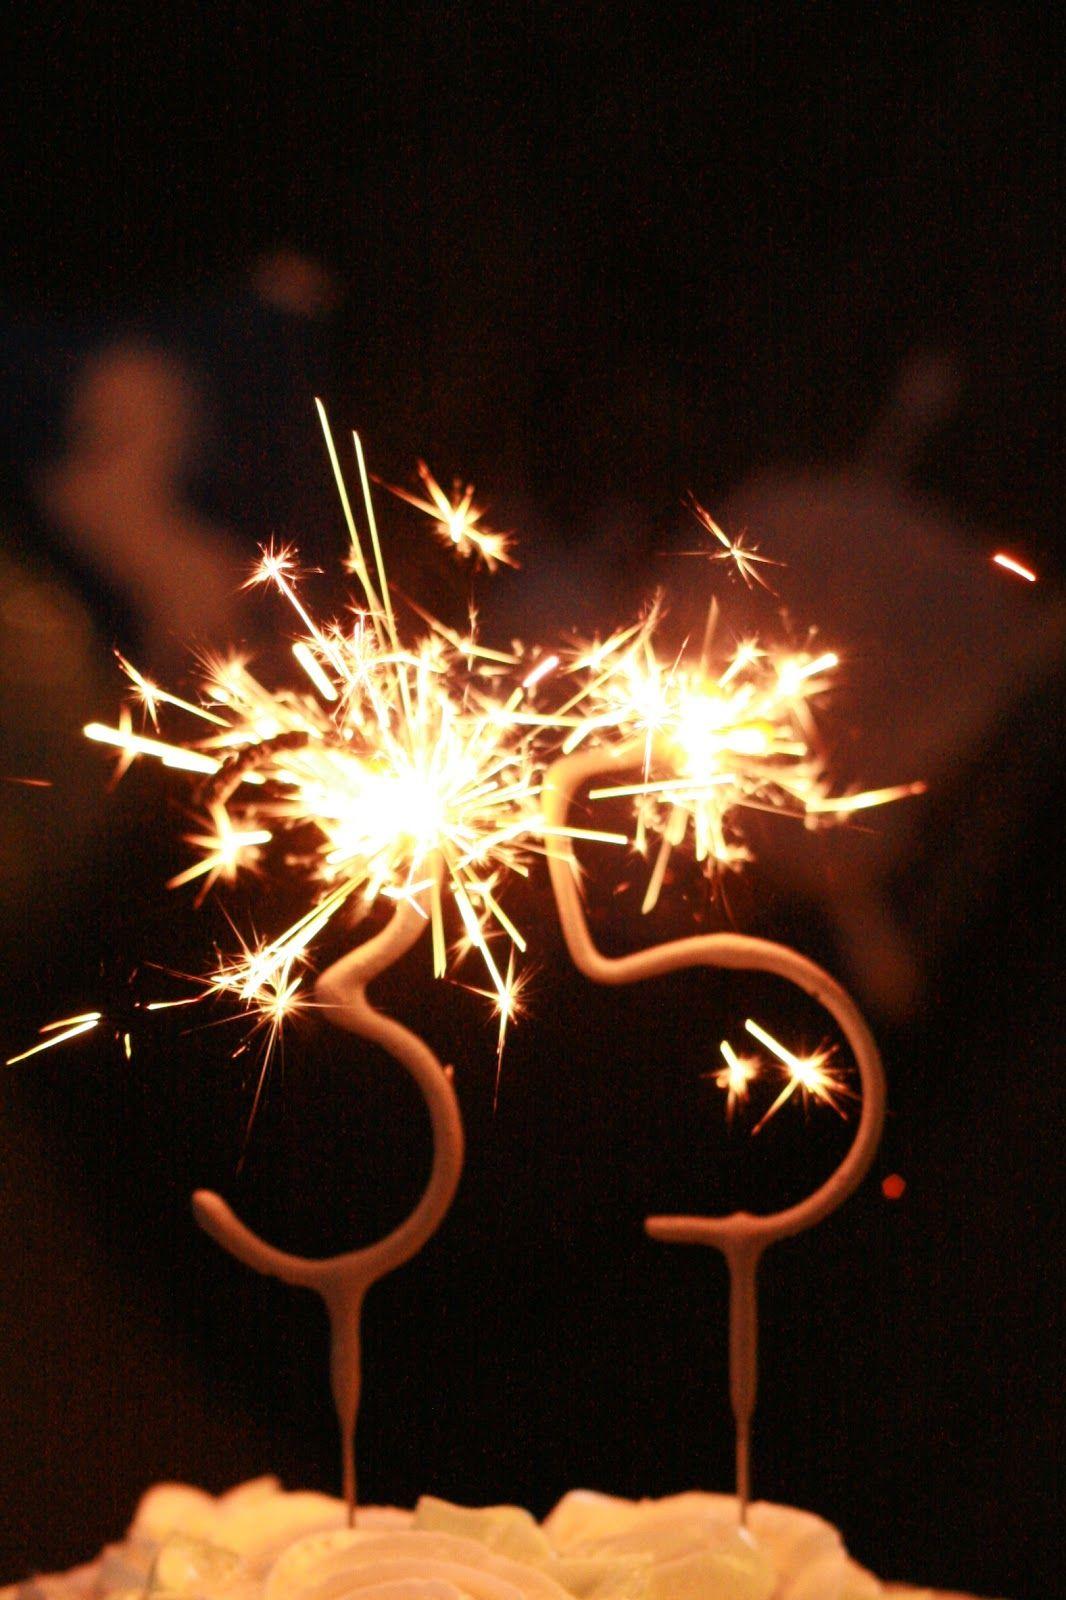 35th Birthday Countdown Birthday Countdown Happy 35th Birthday